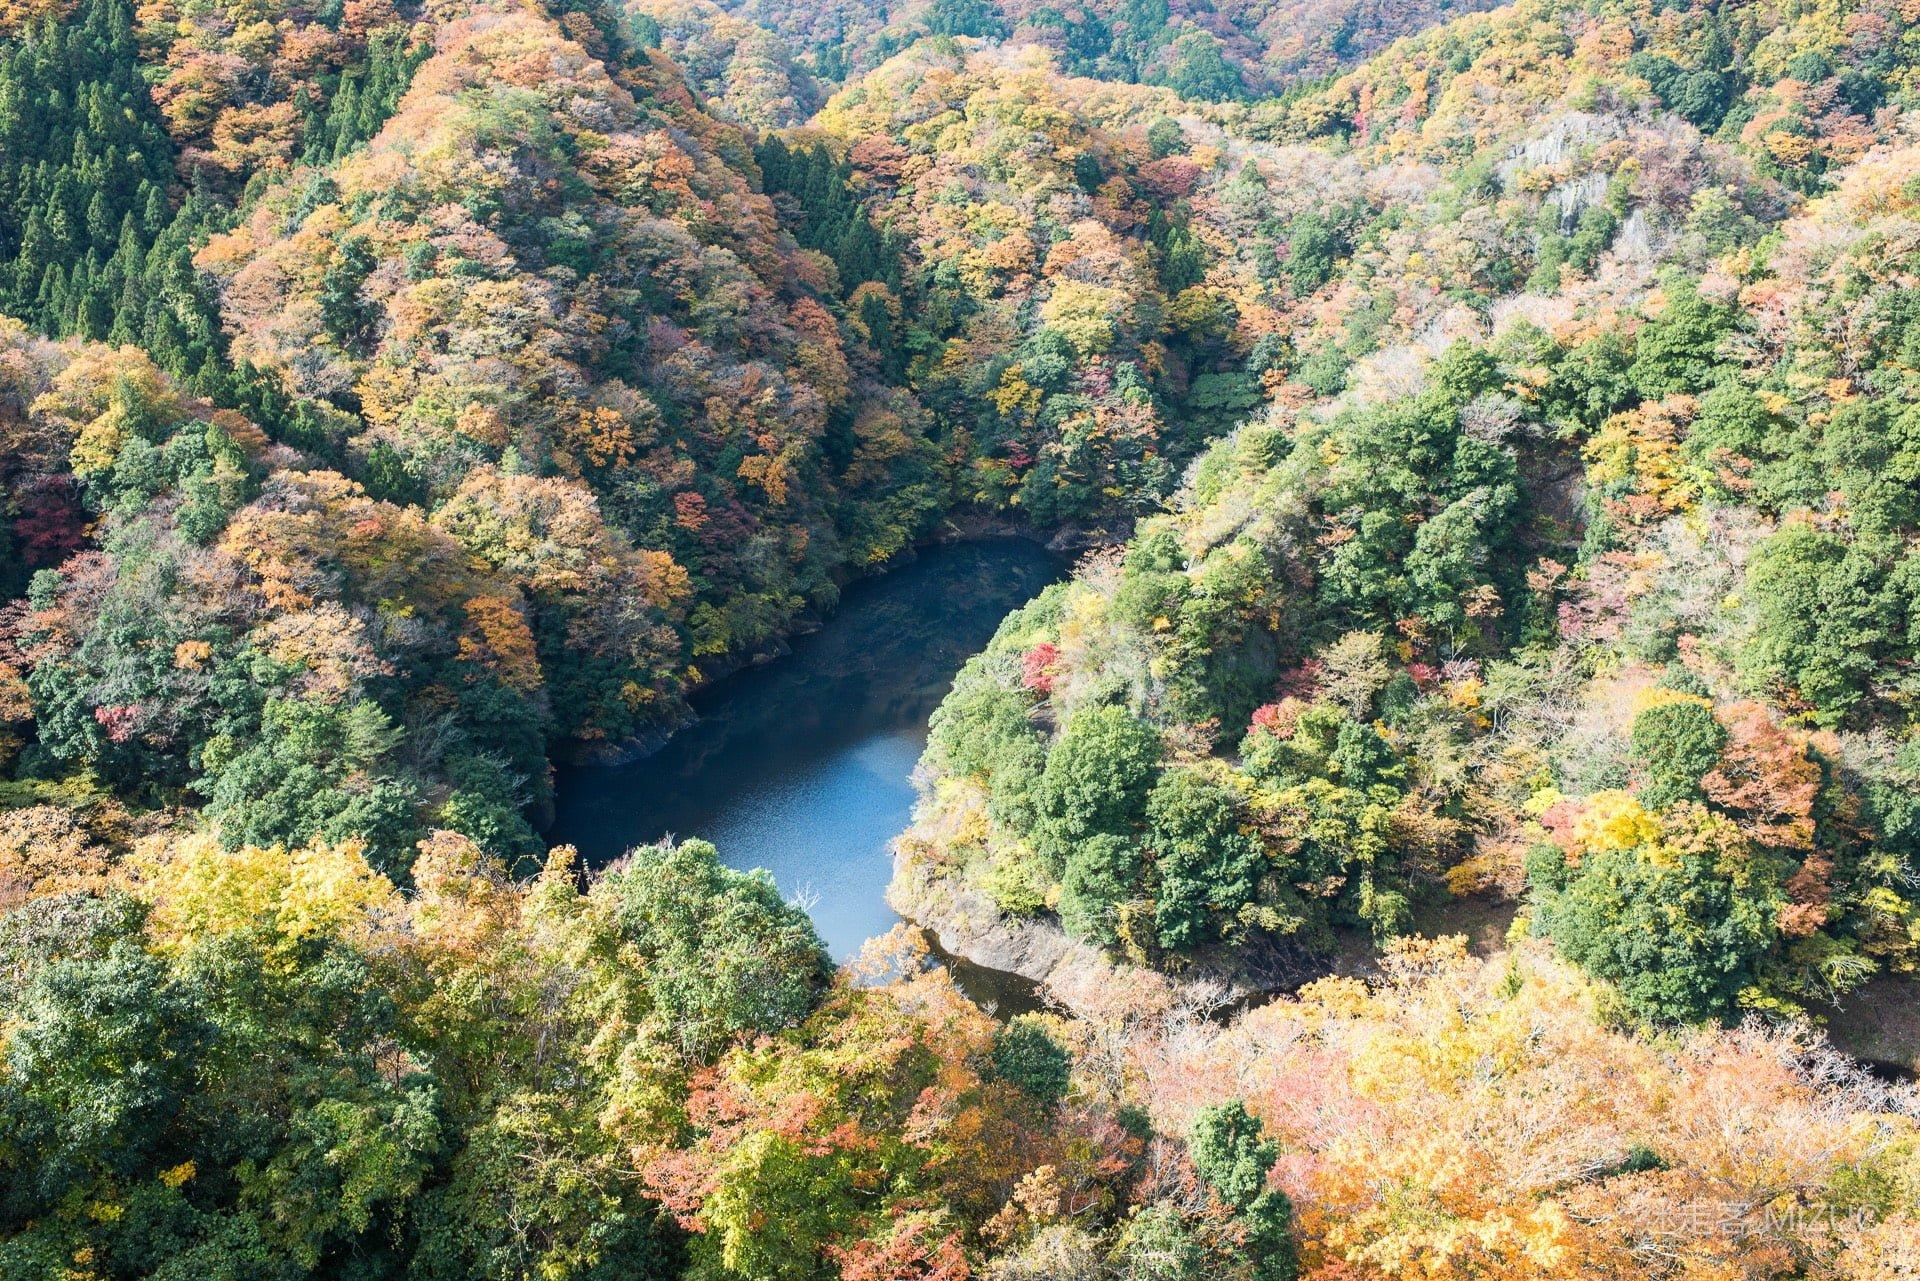 201711 Ibaraki Tochigi Gunma Japan Travel By RentalCar 28 日本自駕旅遊/北關東三縣「茨城、櫪木、群馬」秋天美食、溫泉與瀑布秘境百景(精選照片分享)